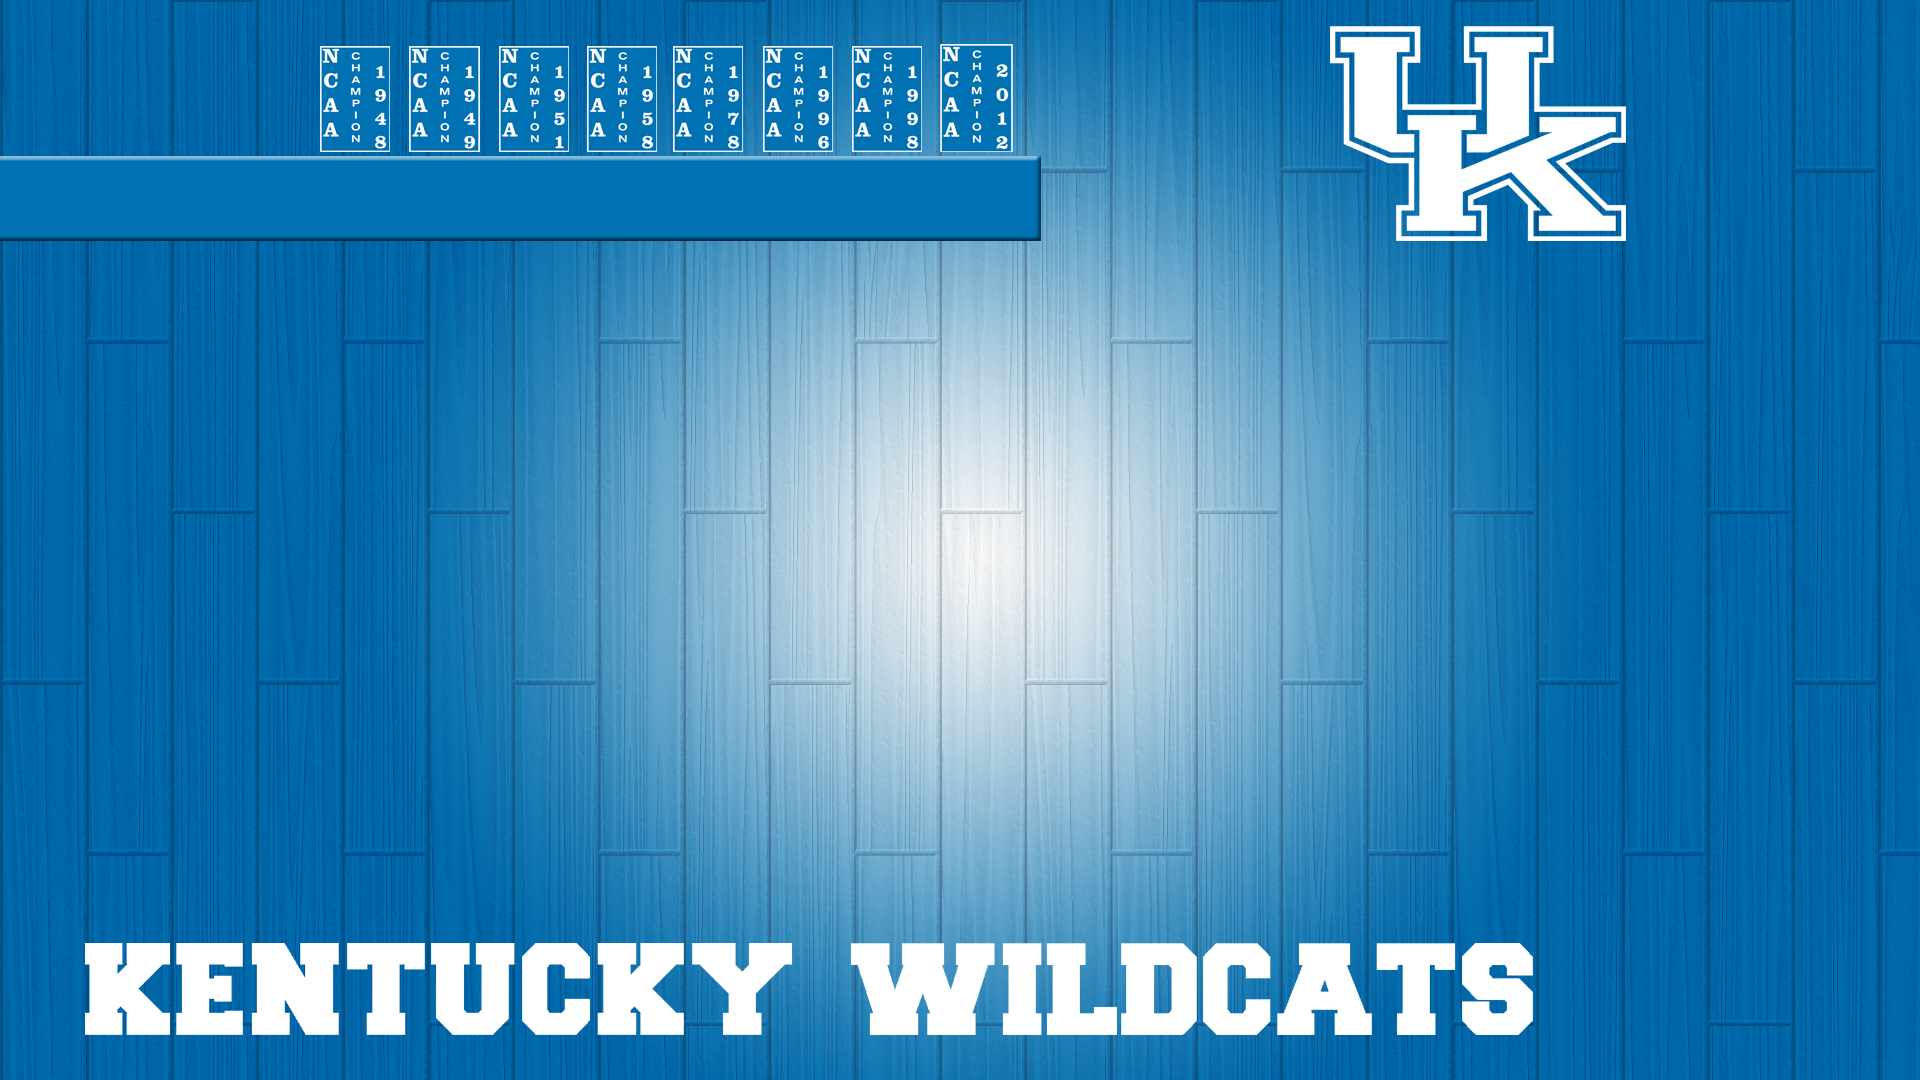 University Of Kentucky Chrome Themes IOS Wallpapers Blogs